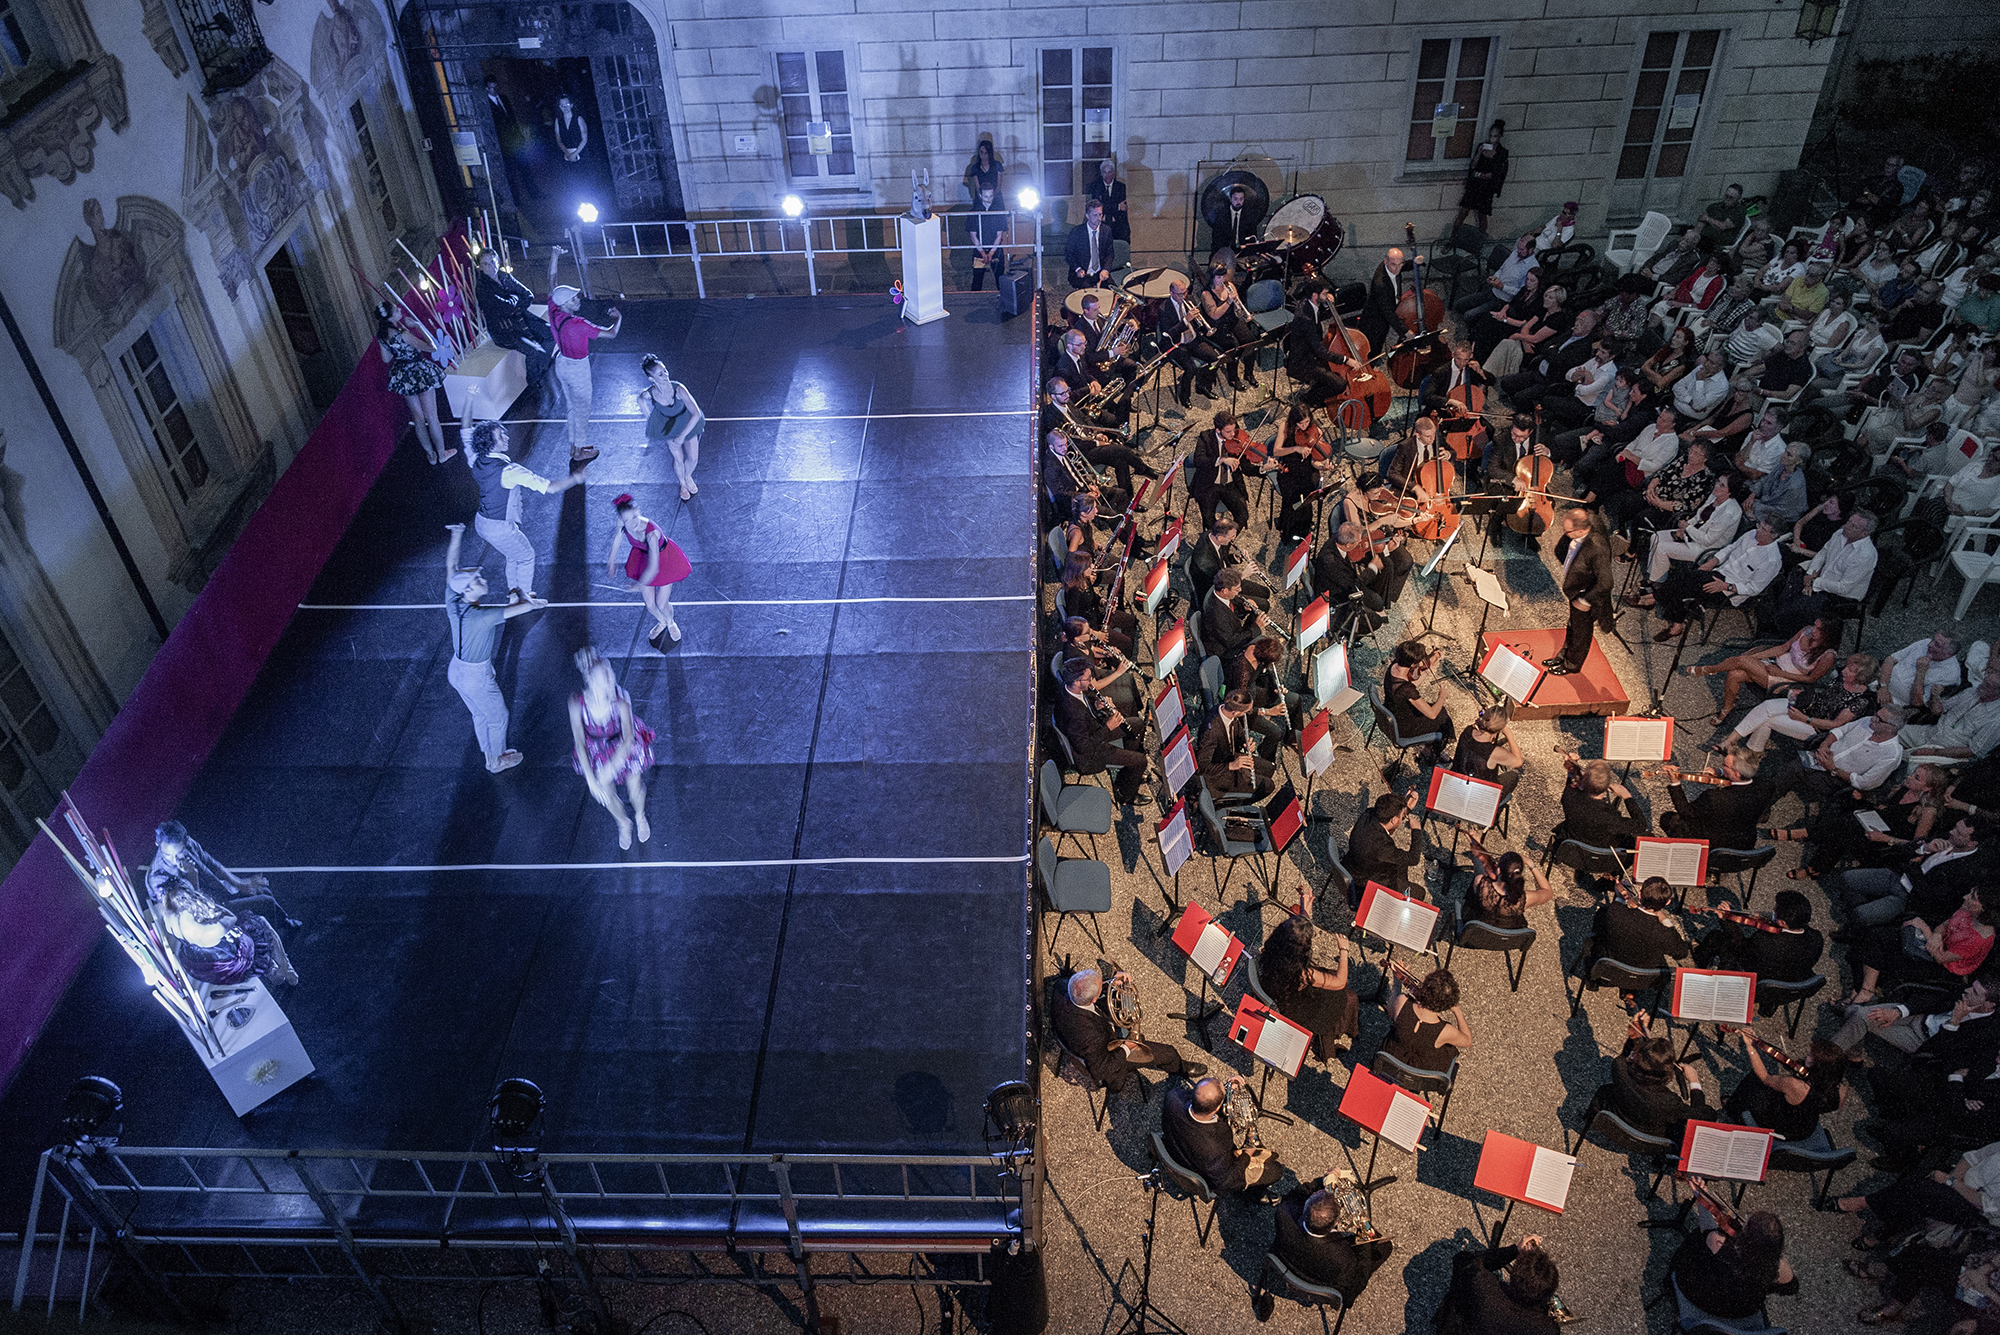 2018-VillaNigra-Opera-Festival-MG_3563